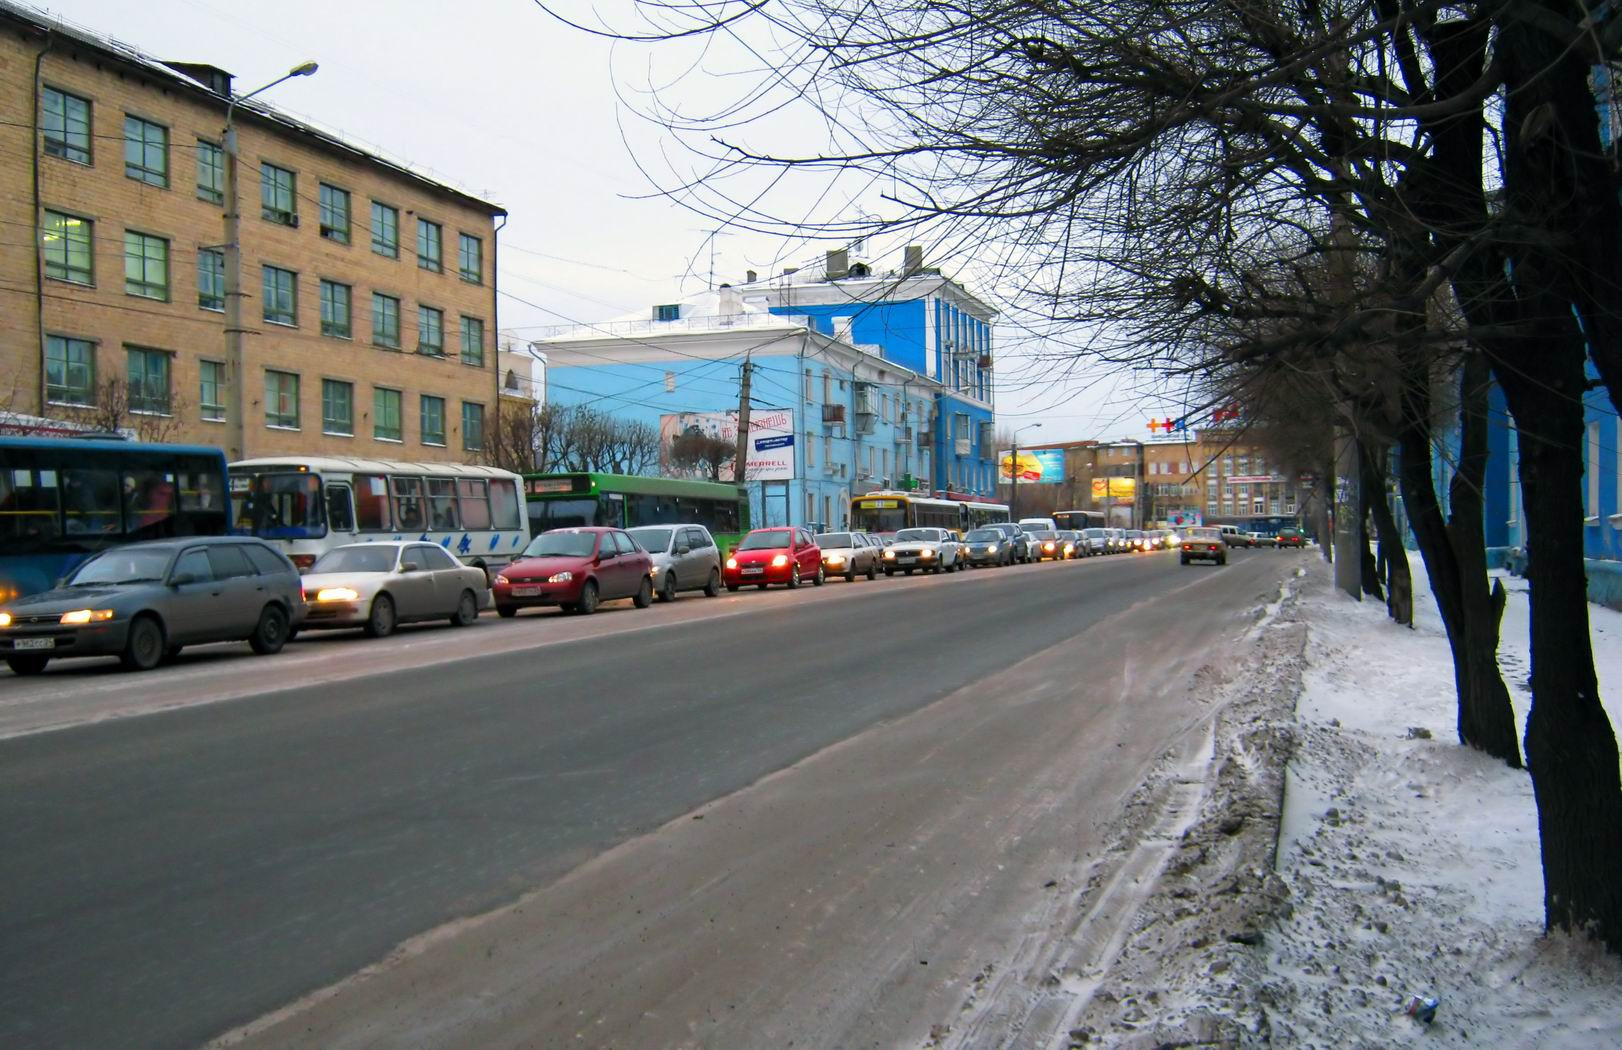 File:Состояние стояния. The Condition of the standing. проспект Свободнный.  - panoramio.jpg - Wikimedia Commons